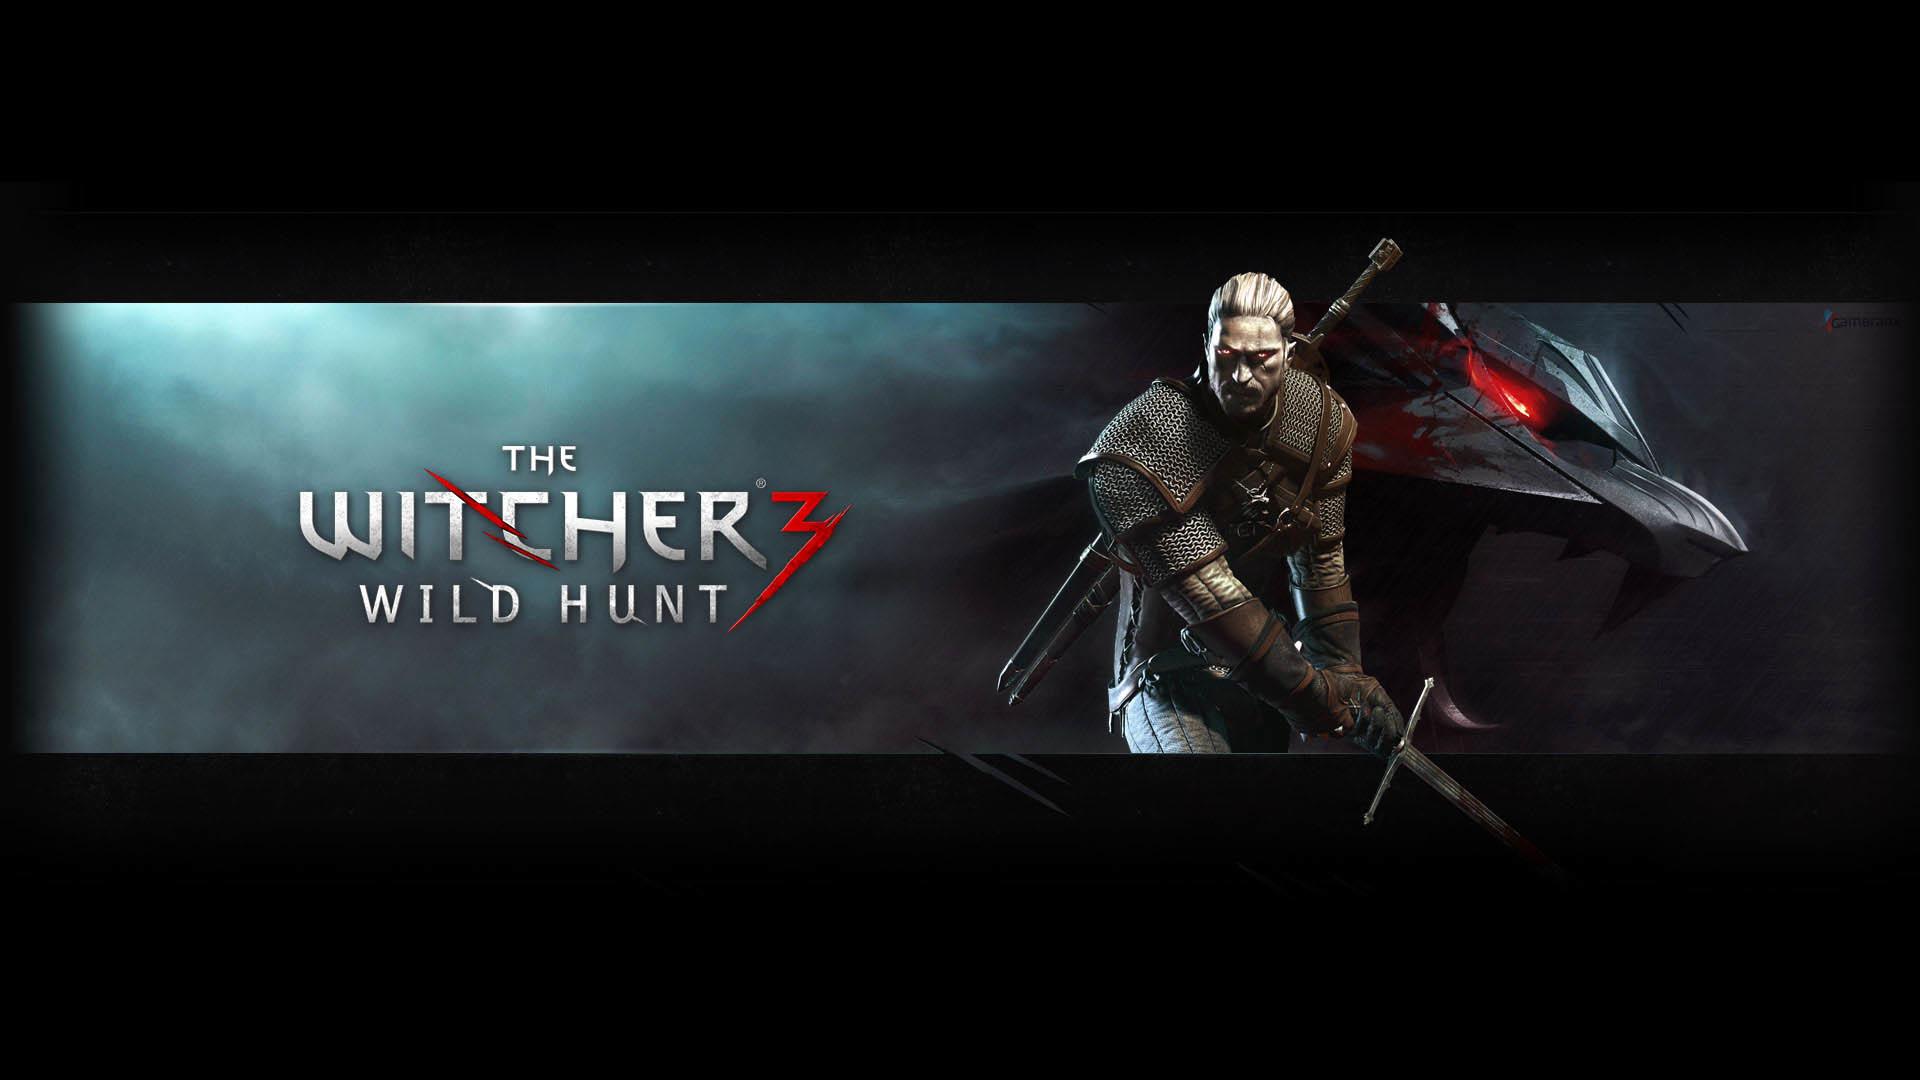 The Witcher 3: Wild Hunt Nice Wallpaper wallpaper